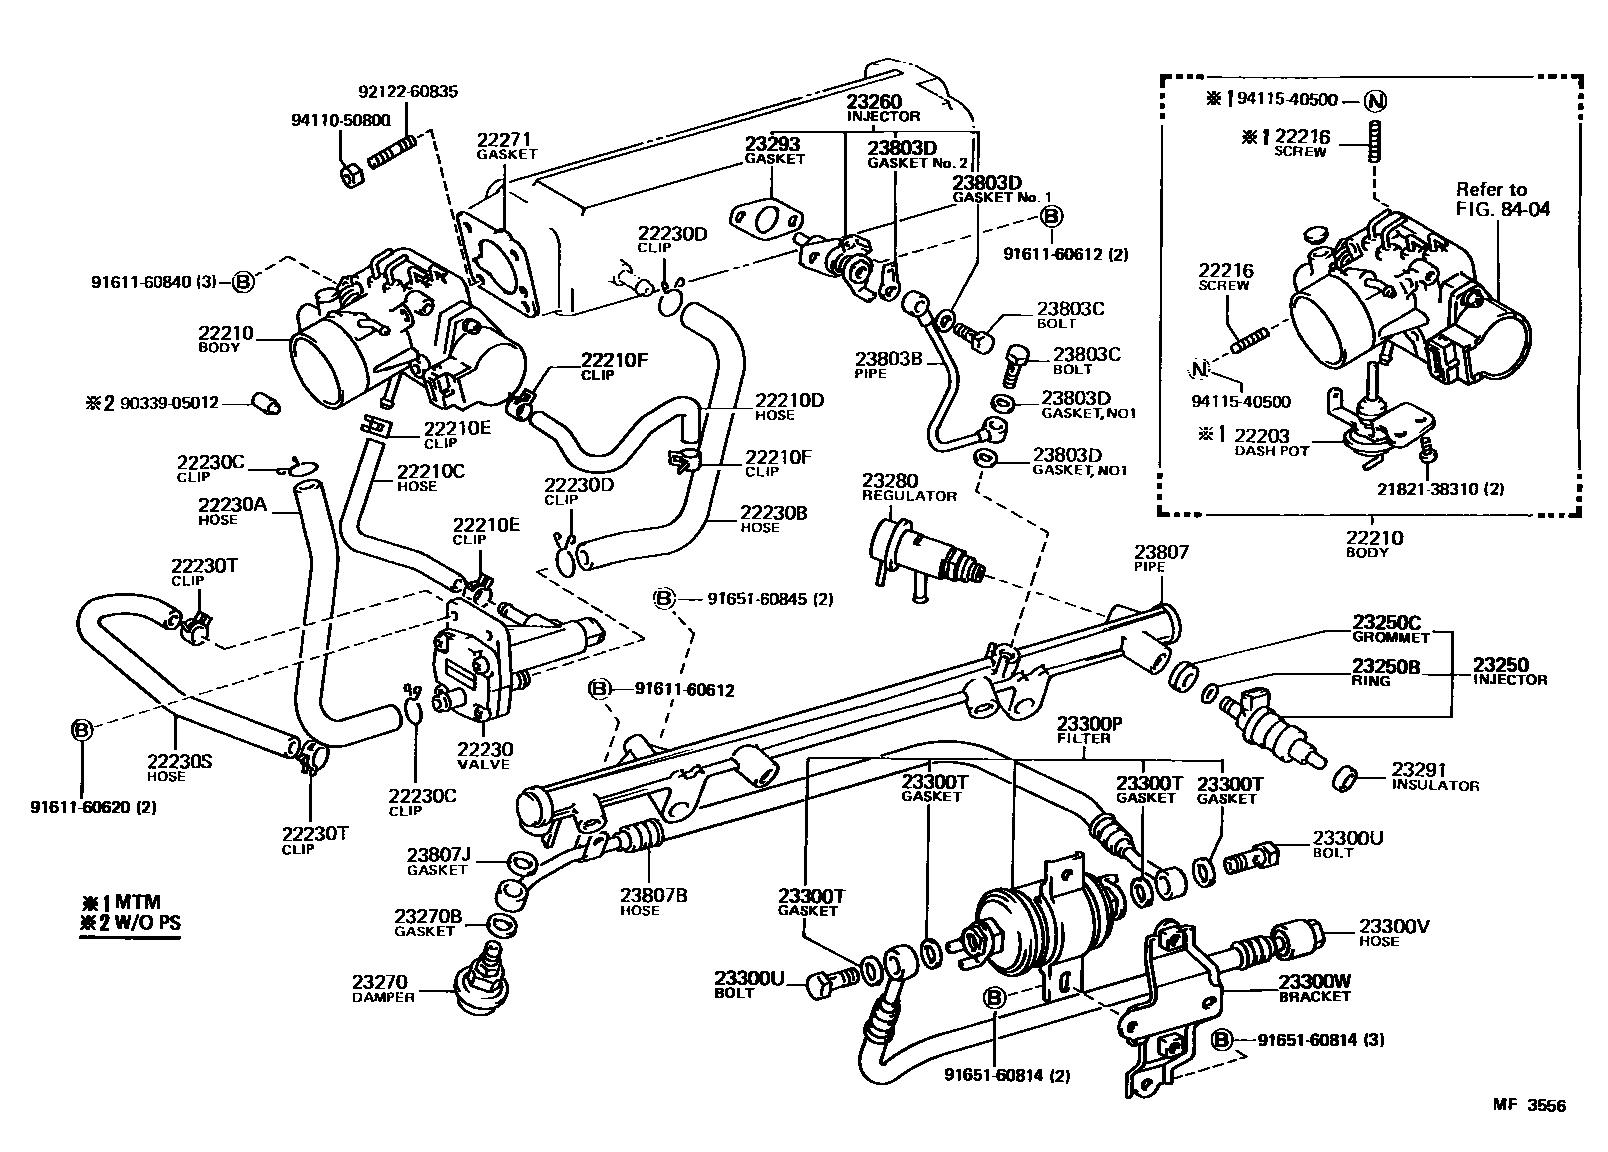 toyota corolla wiring diagram also 1989 toyota pickup 22re vacuum